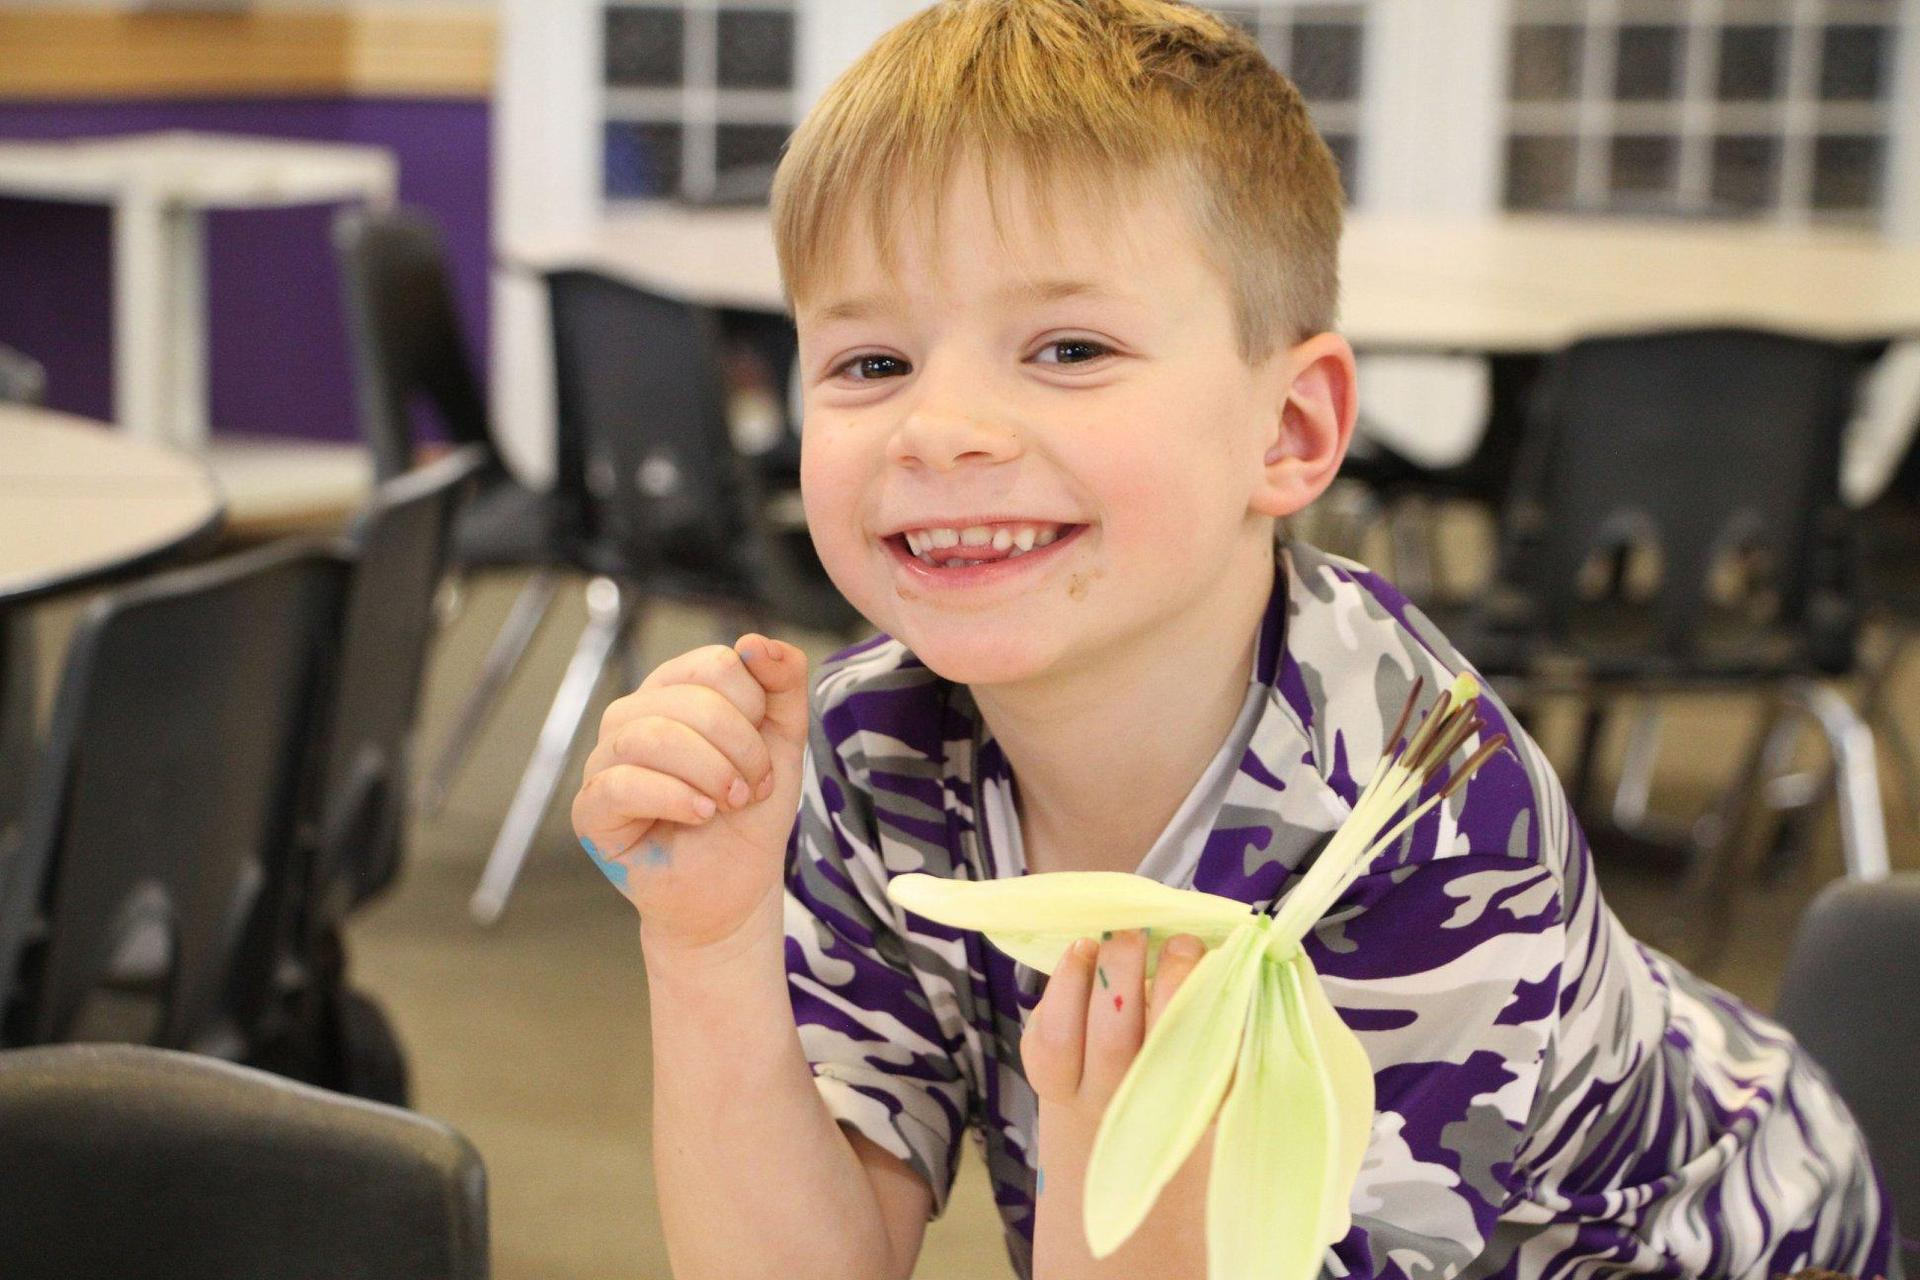 Boy holding lilly